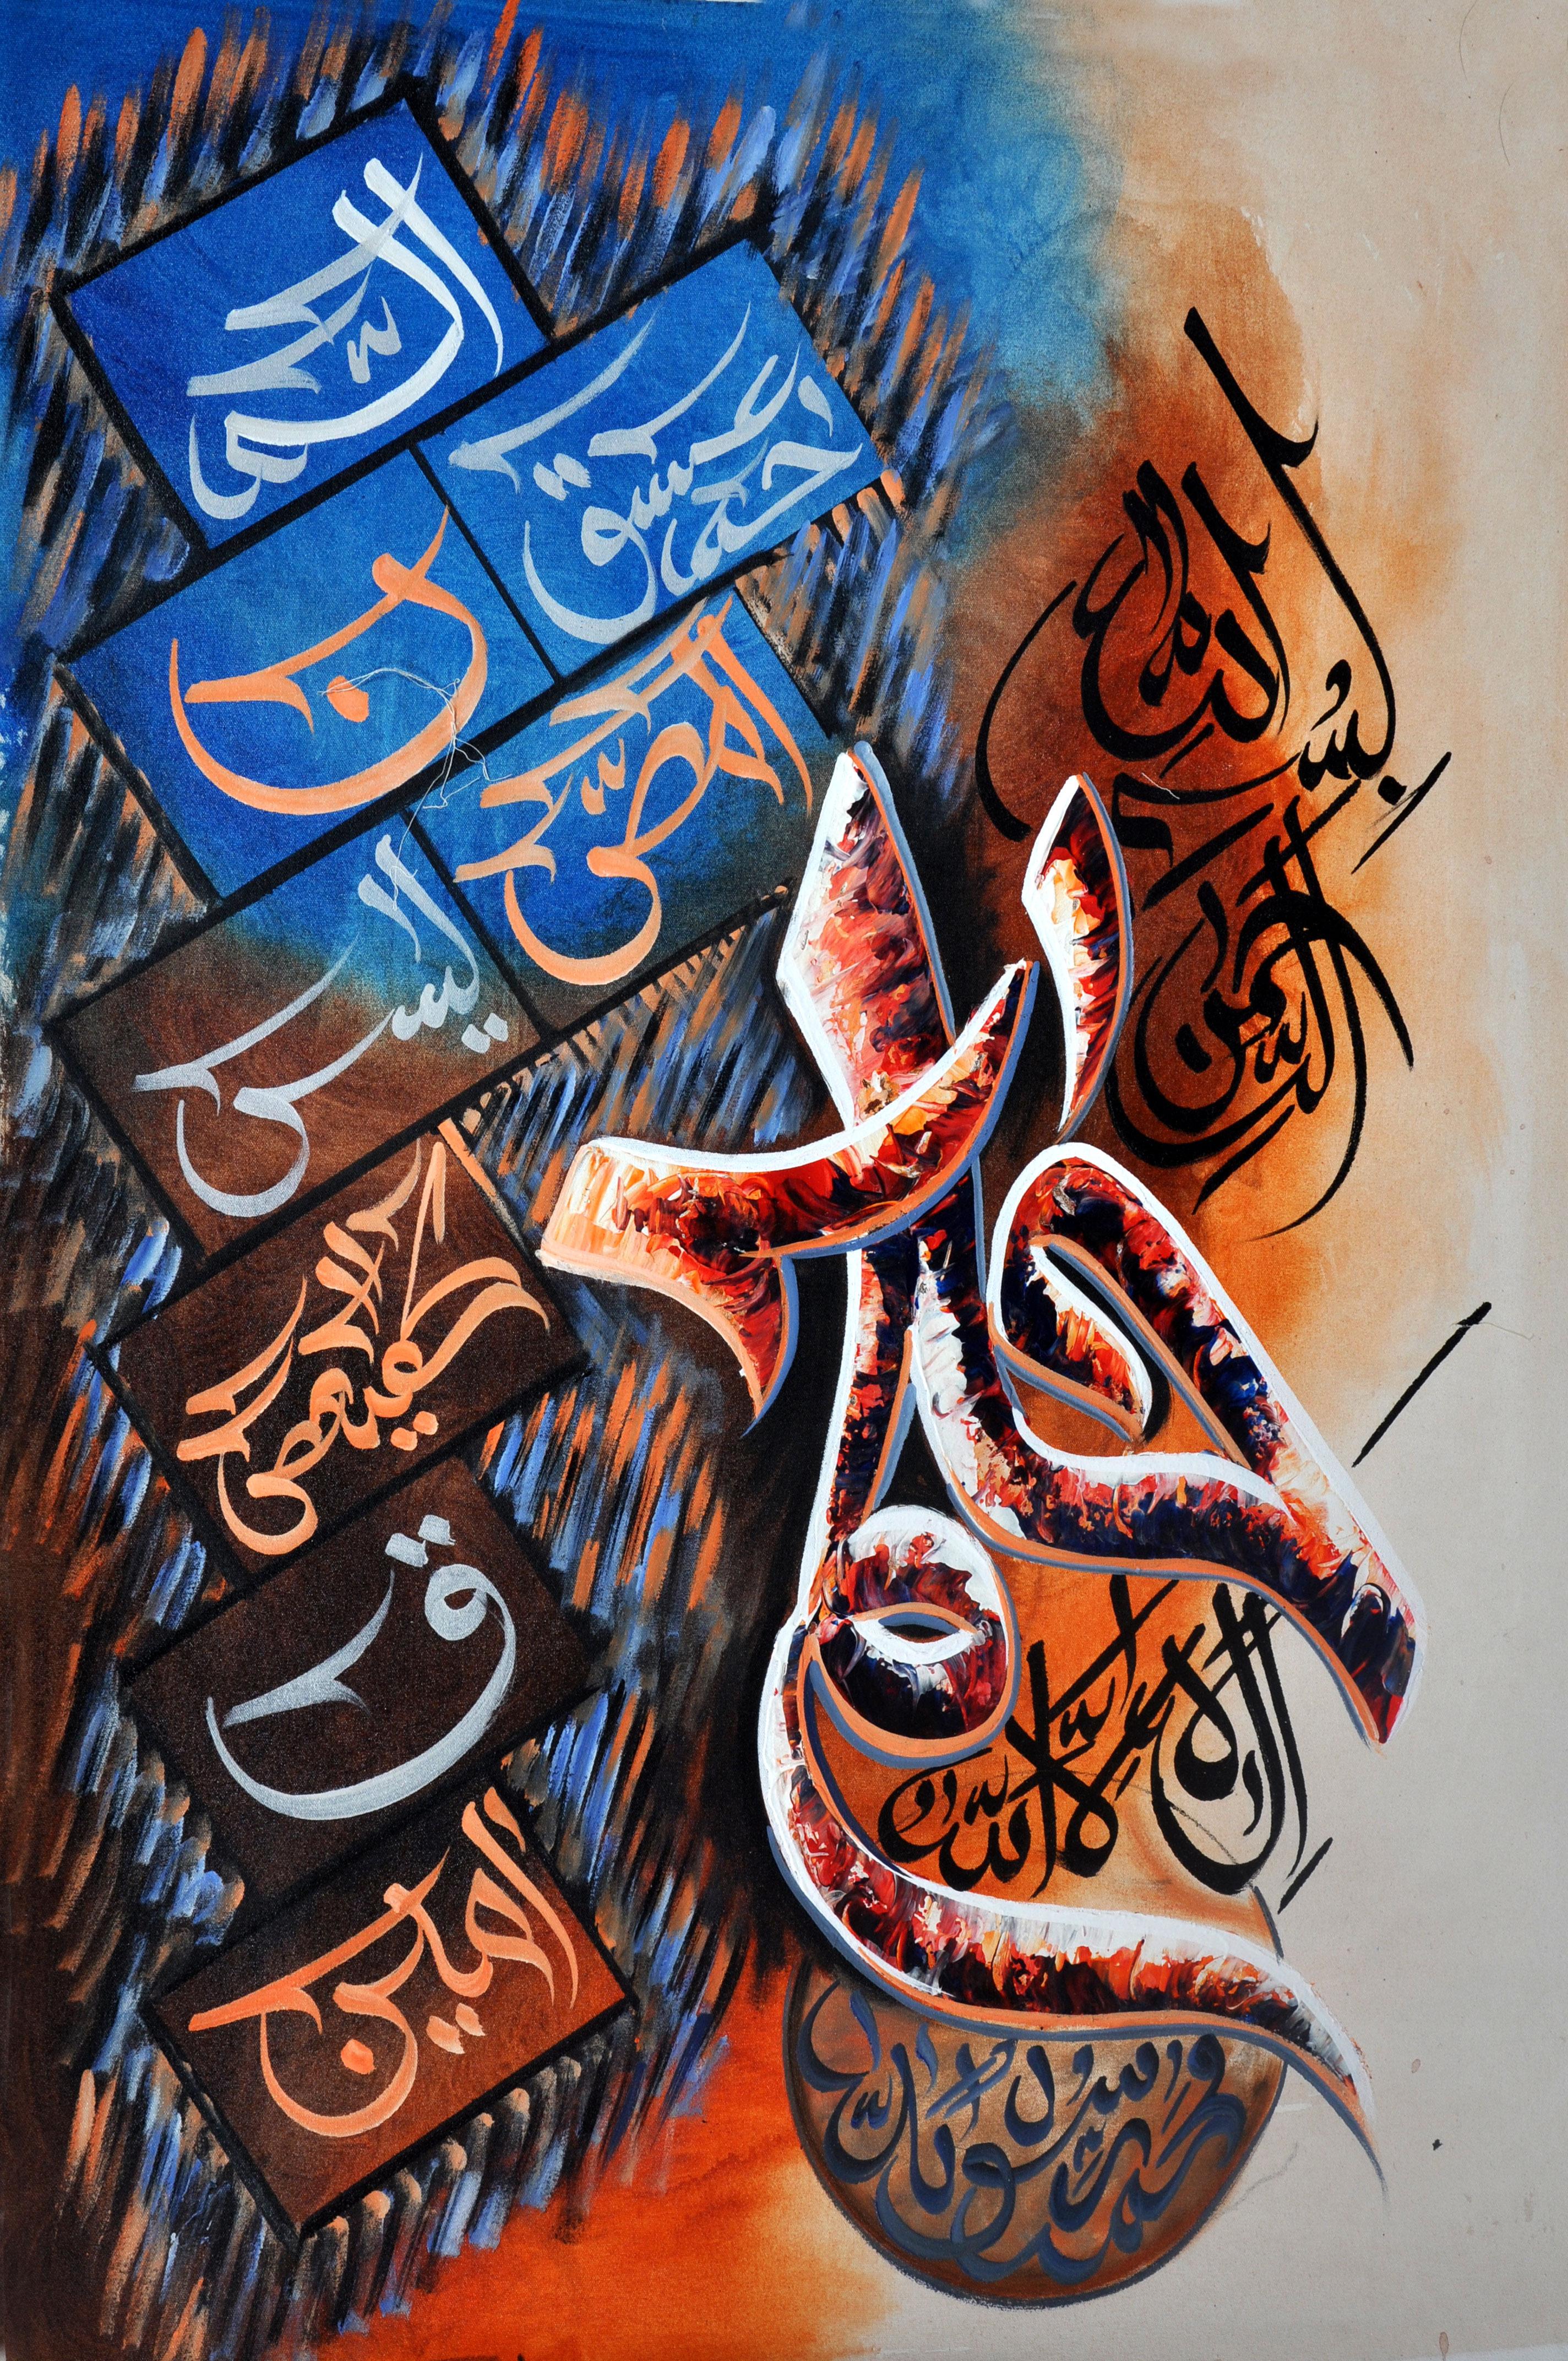 loh-e-qurani calligraphy art